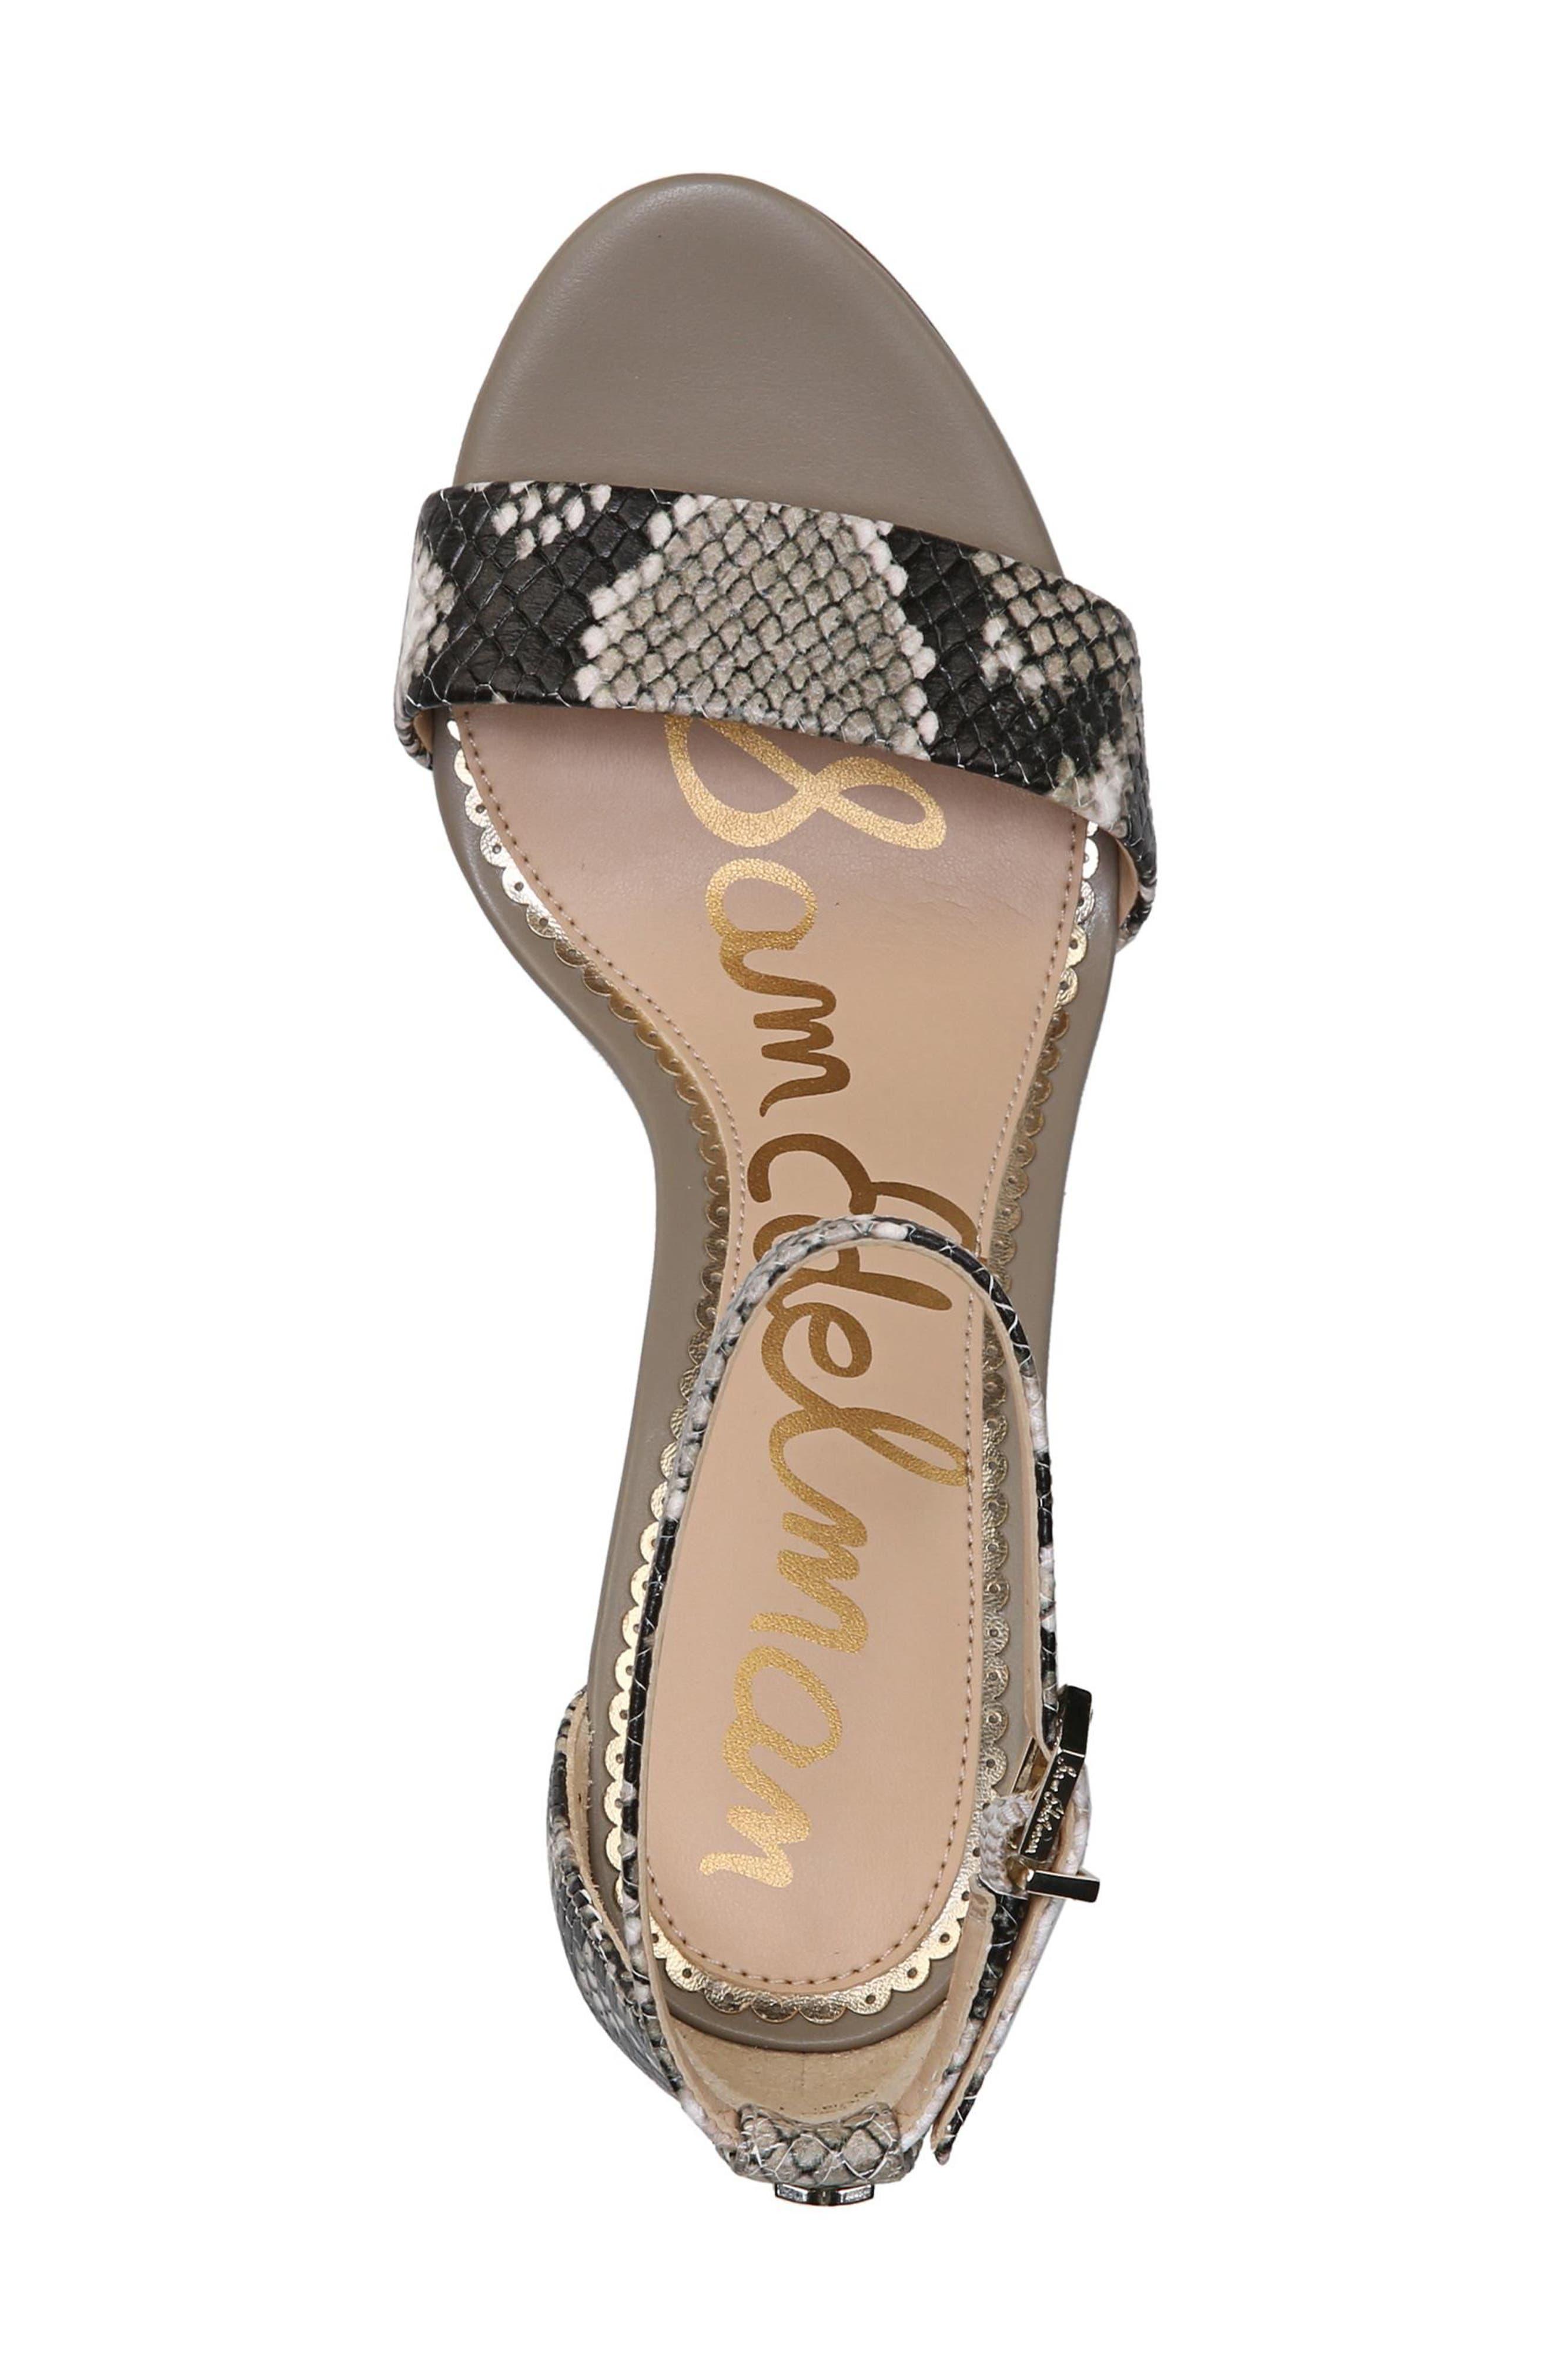 Yaro Ankle Strap Sandal,                             Alternate thumbnail 6, color,                             Natural Snake Print Leather